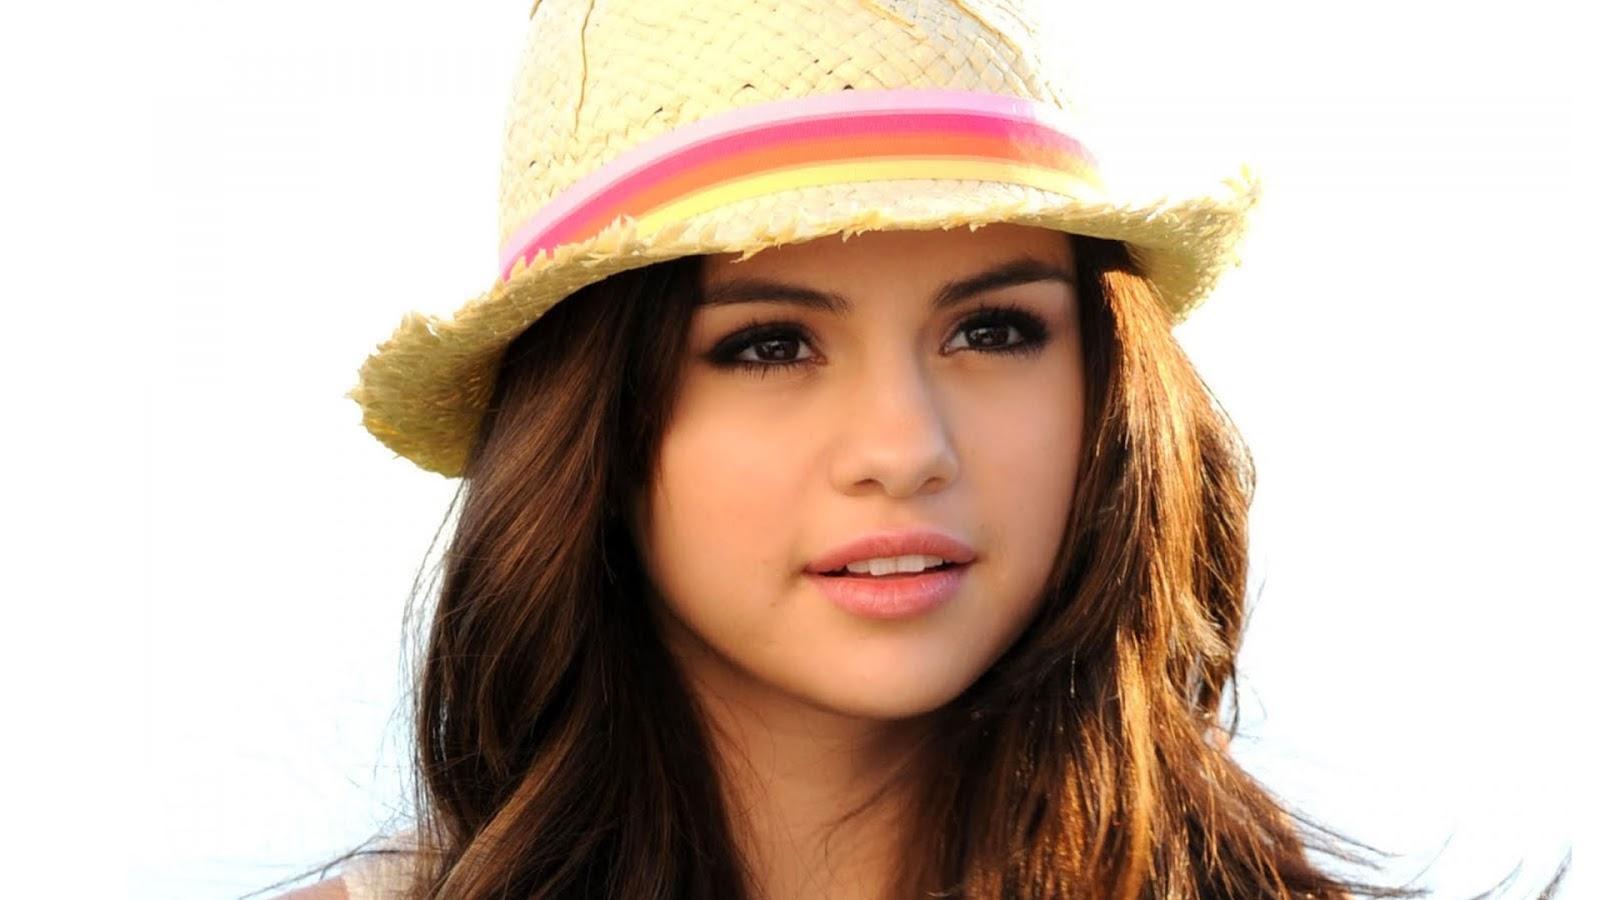 Arrestan a hombre por entrar a la casa de Selena Gomez